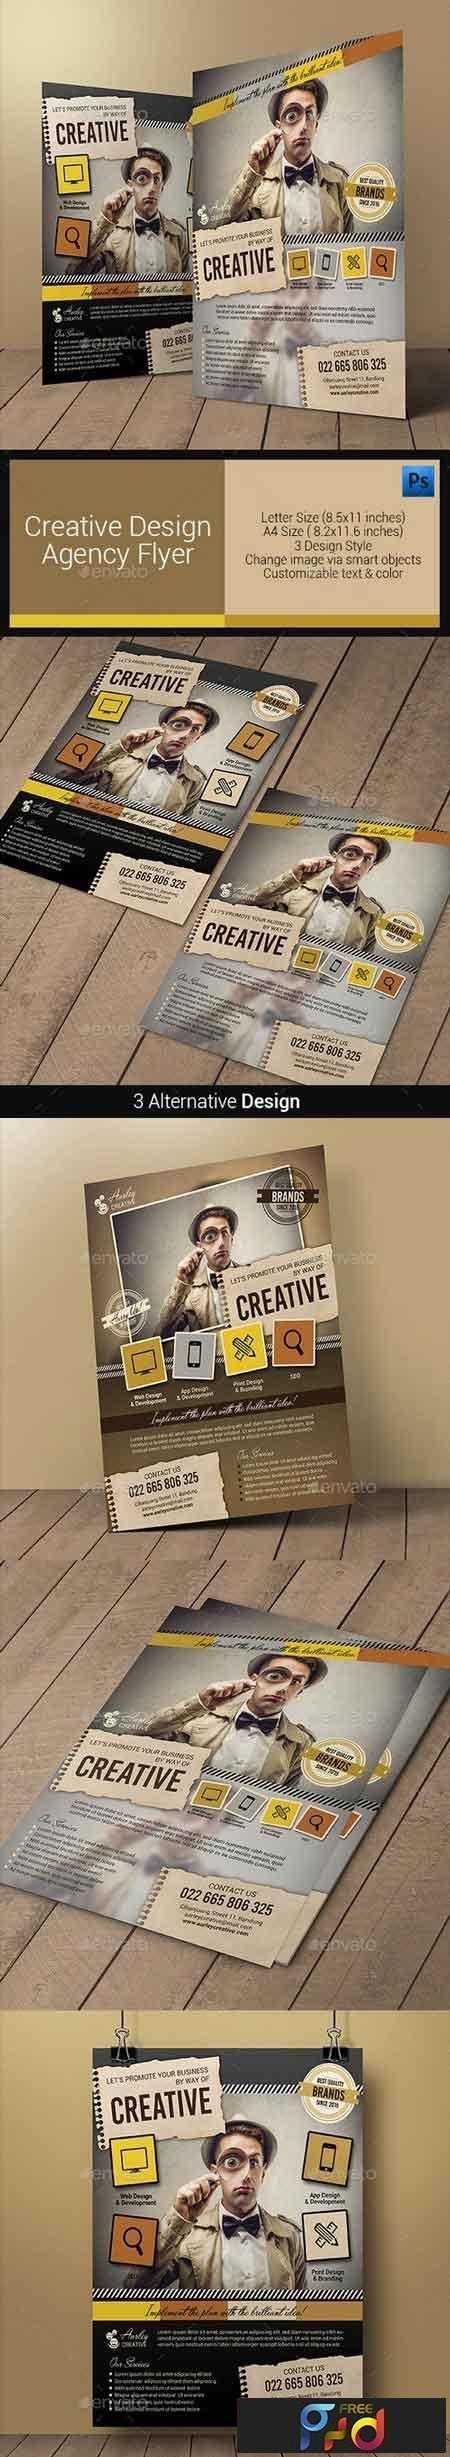 1809092 Creative Design Agency Flyers 10880677 1